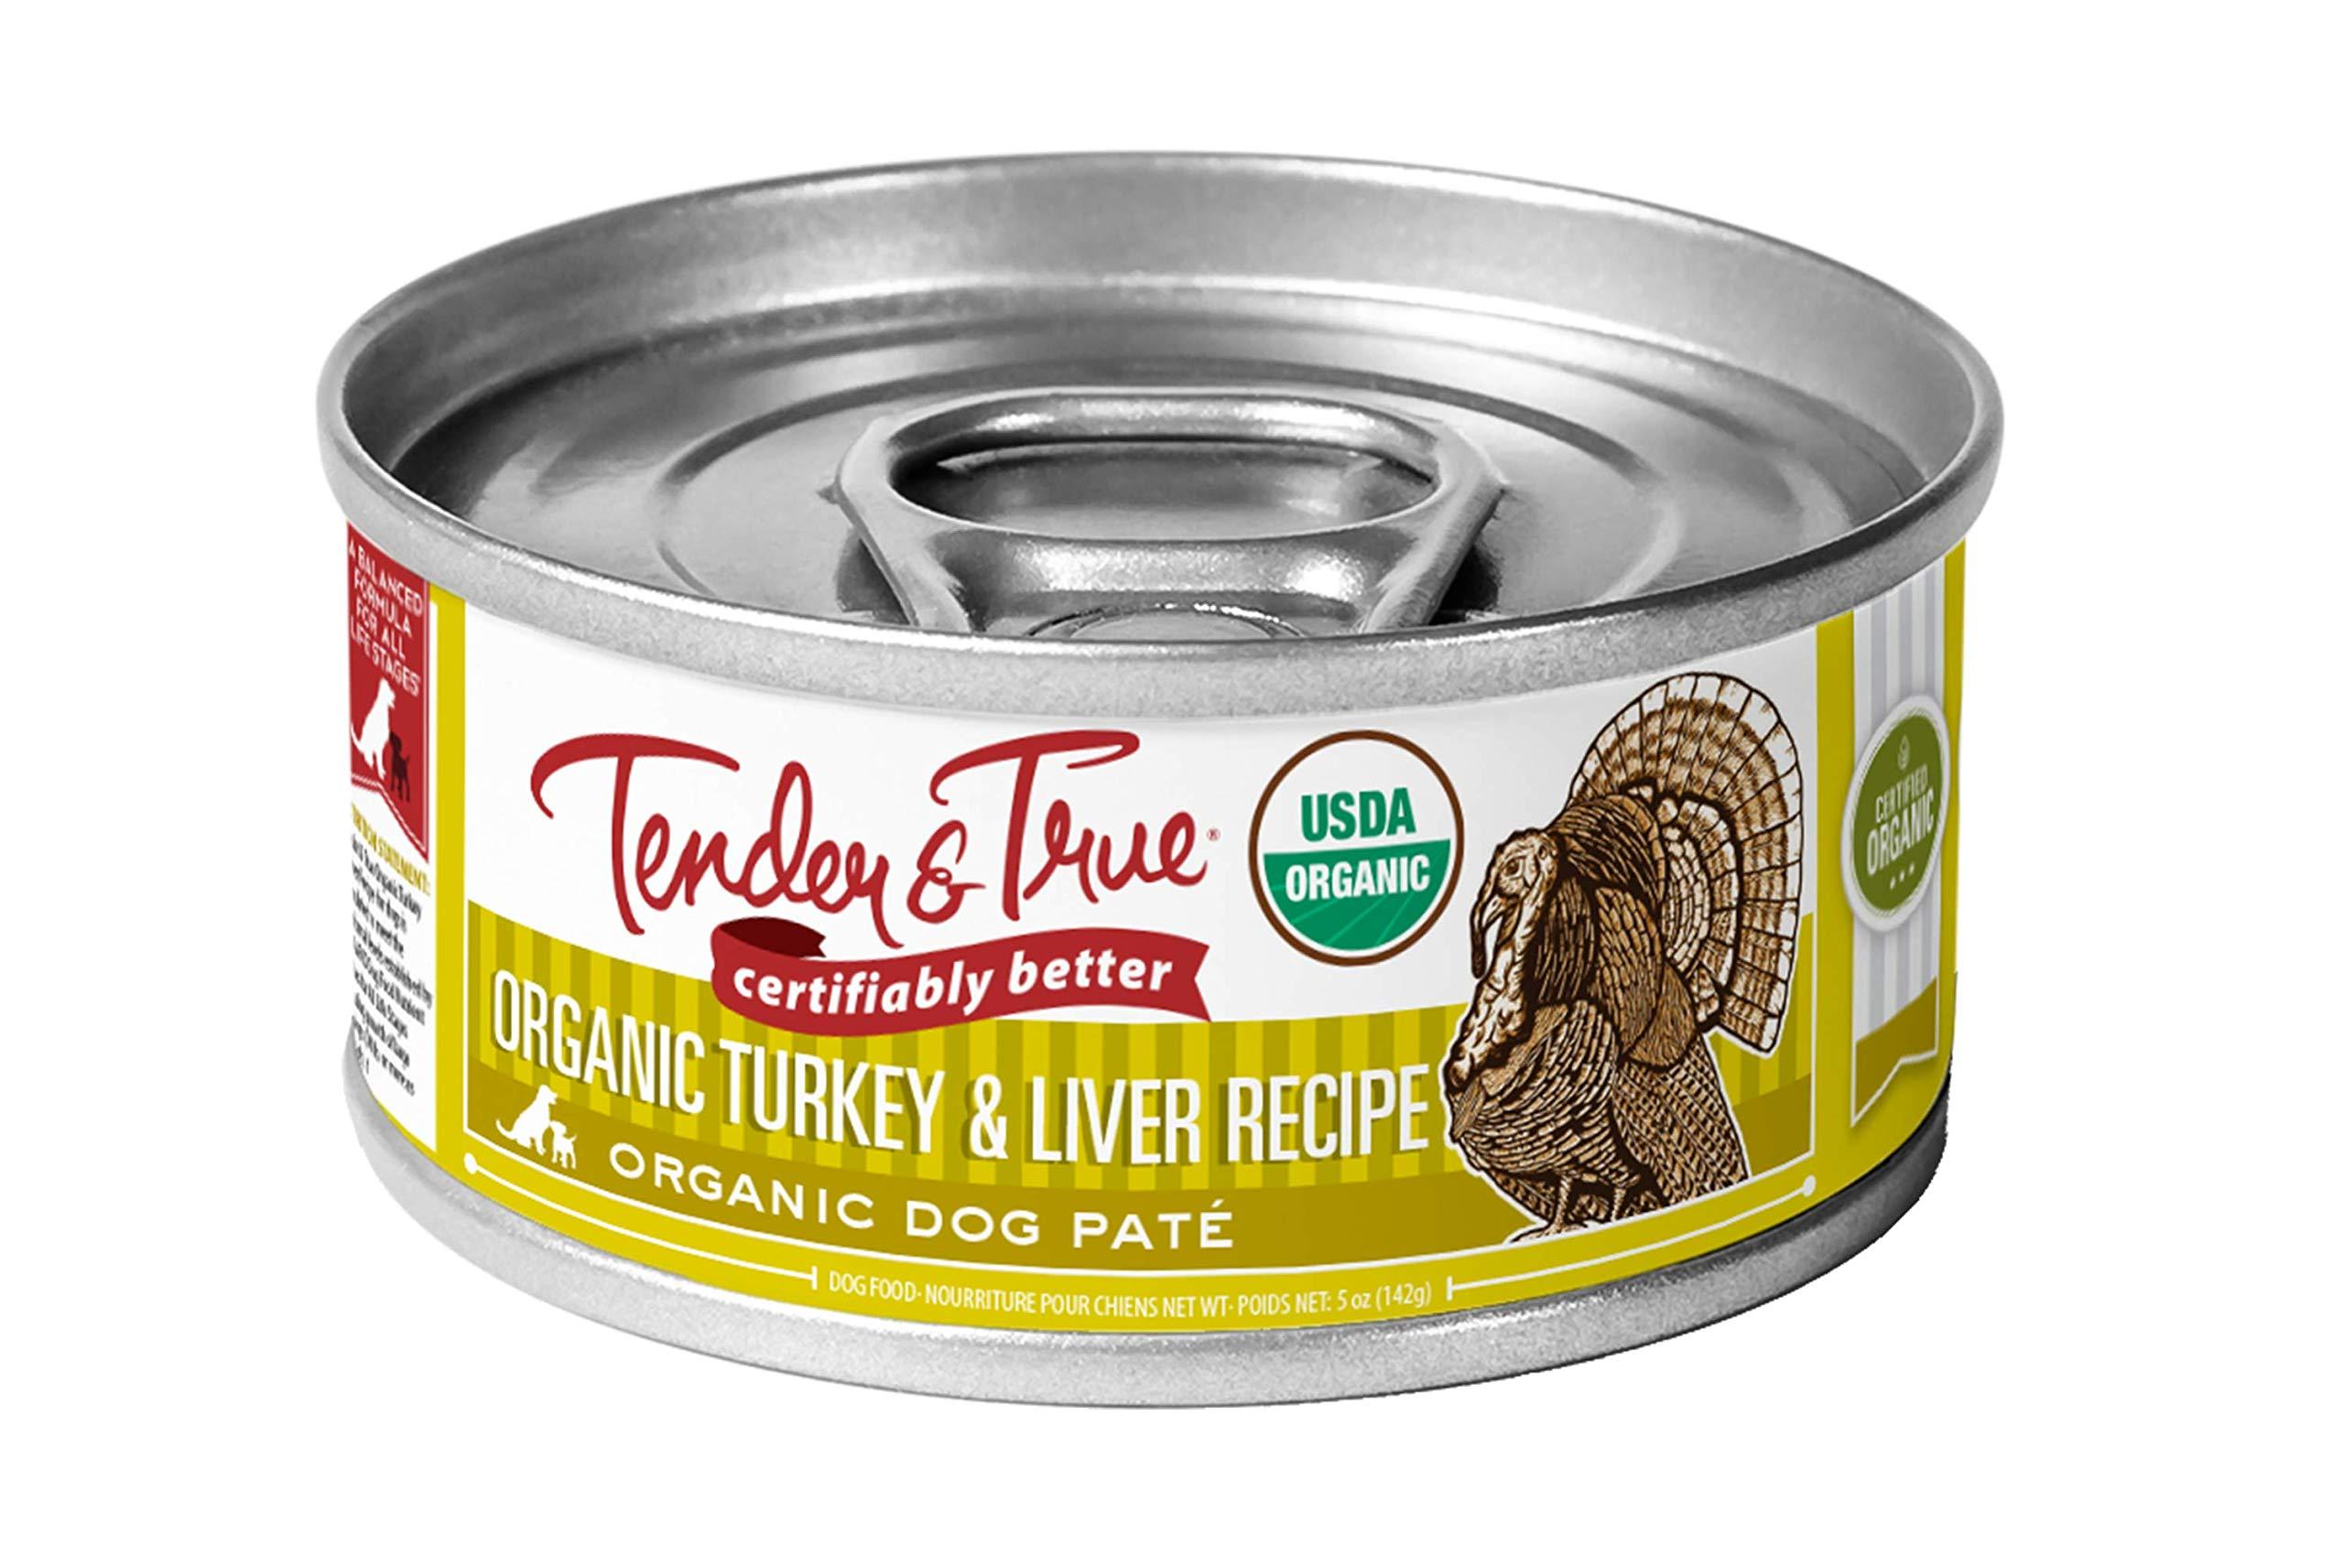 Tender & True Organic Turkey & Liver Recipe Canned Dog Food, 5.5 oz, Case of 24 by Tender & True Pet Nutrition